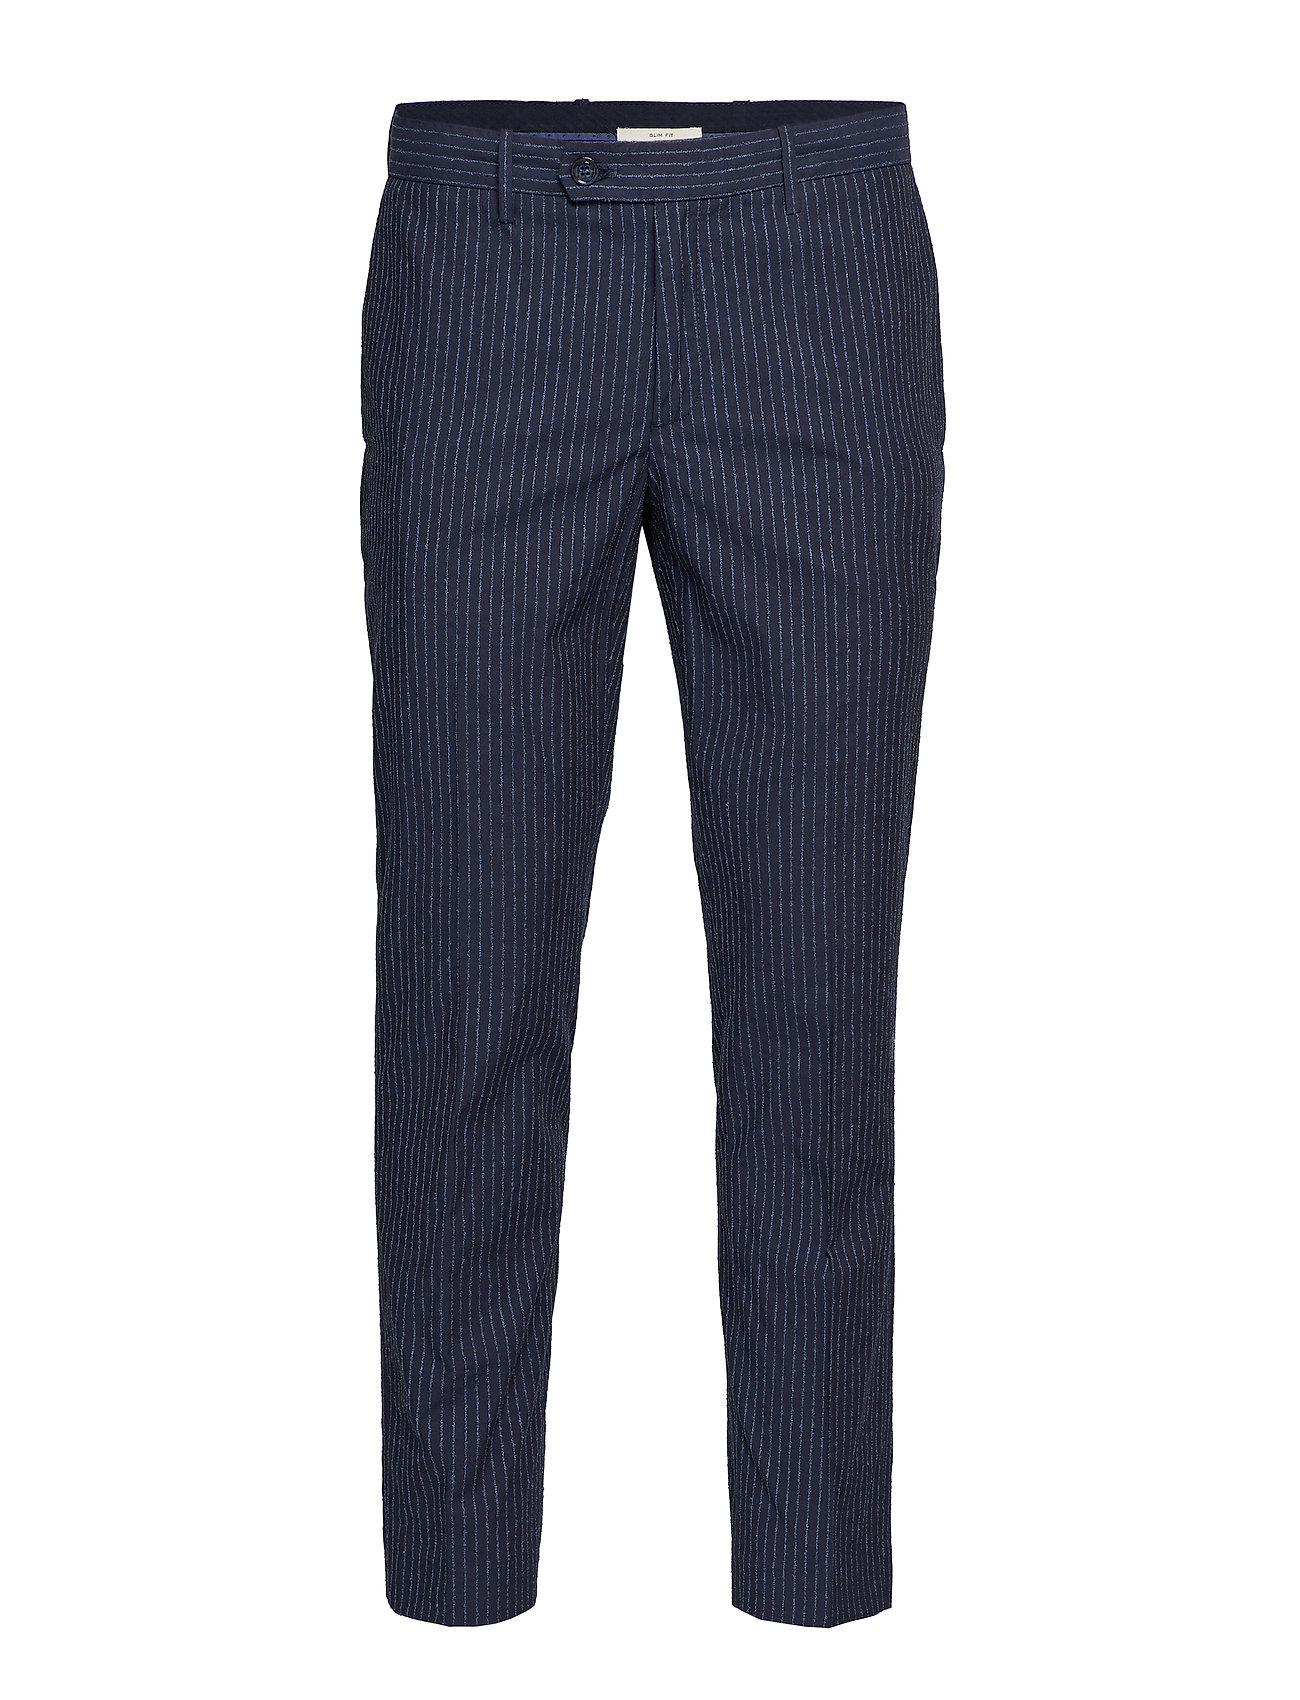 Mango Man Slim fit striped texture trousers - NAVY